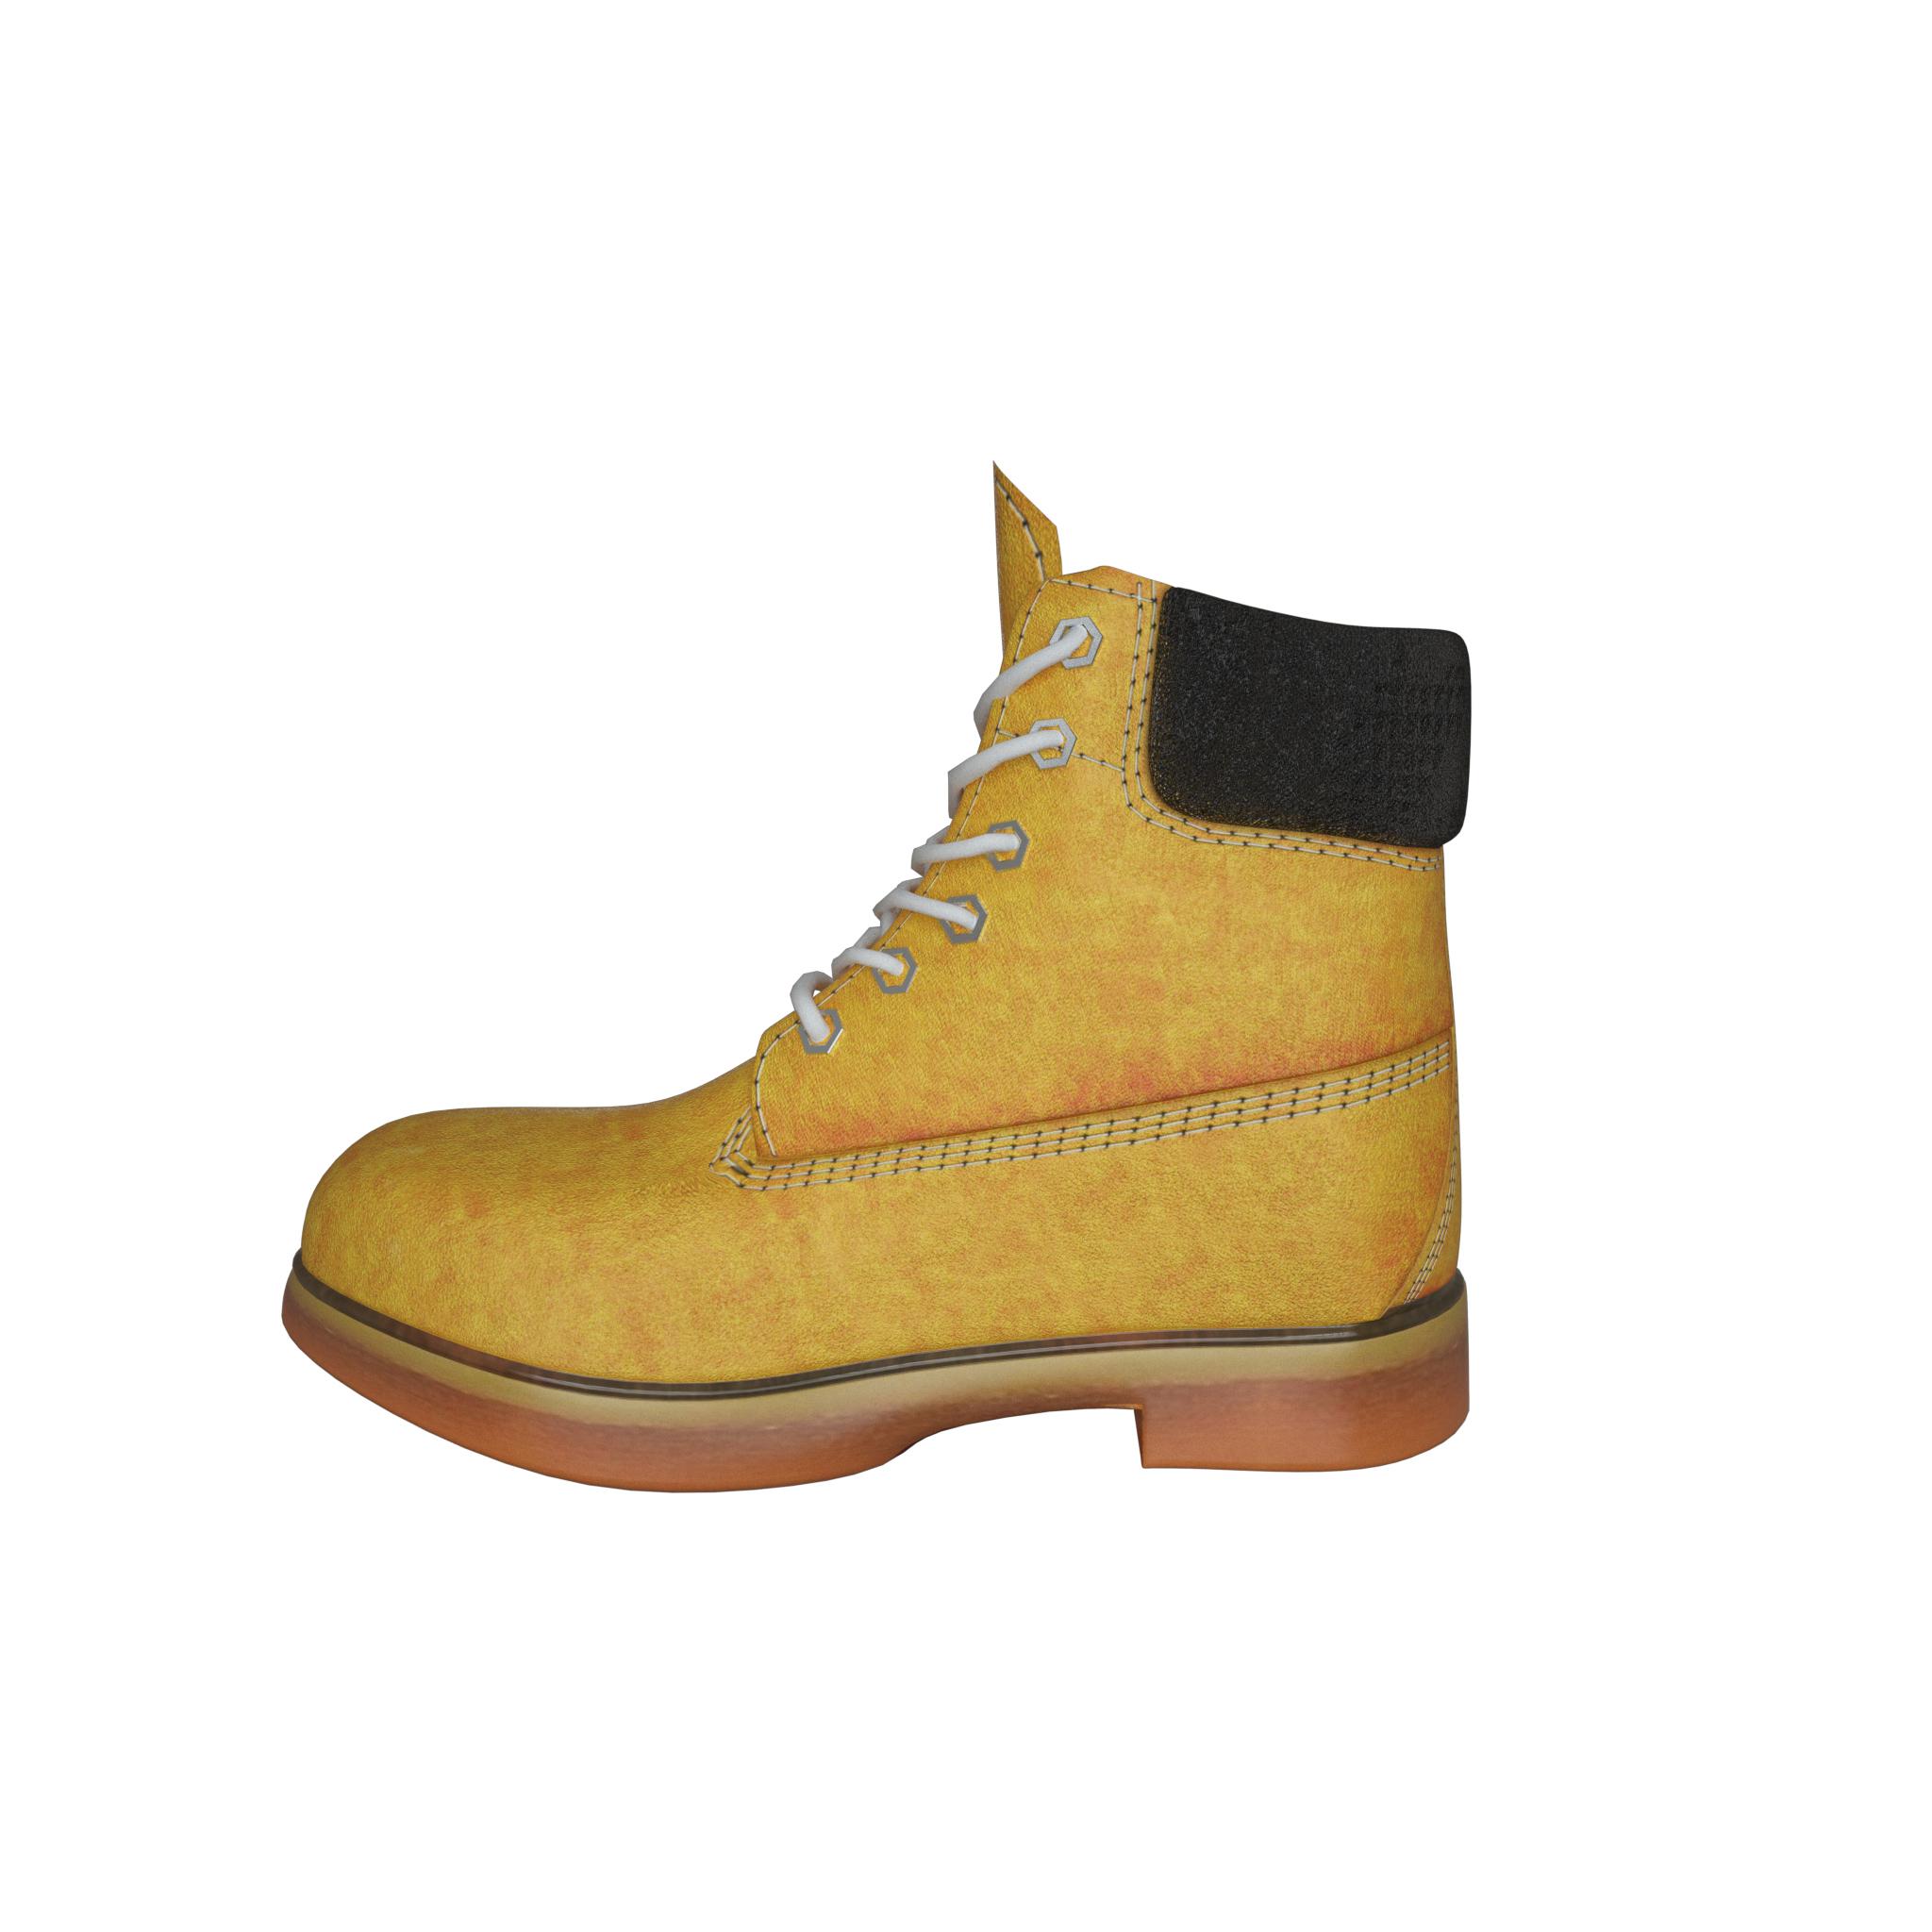 Timberland 6 inch boot Men